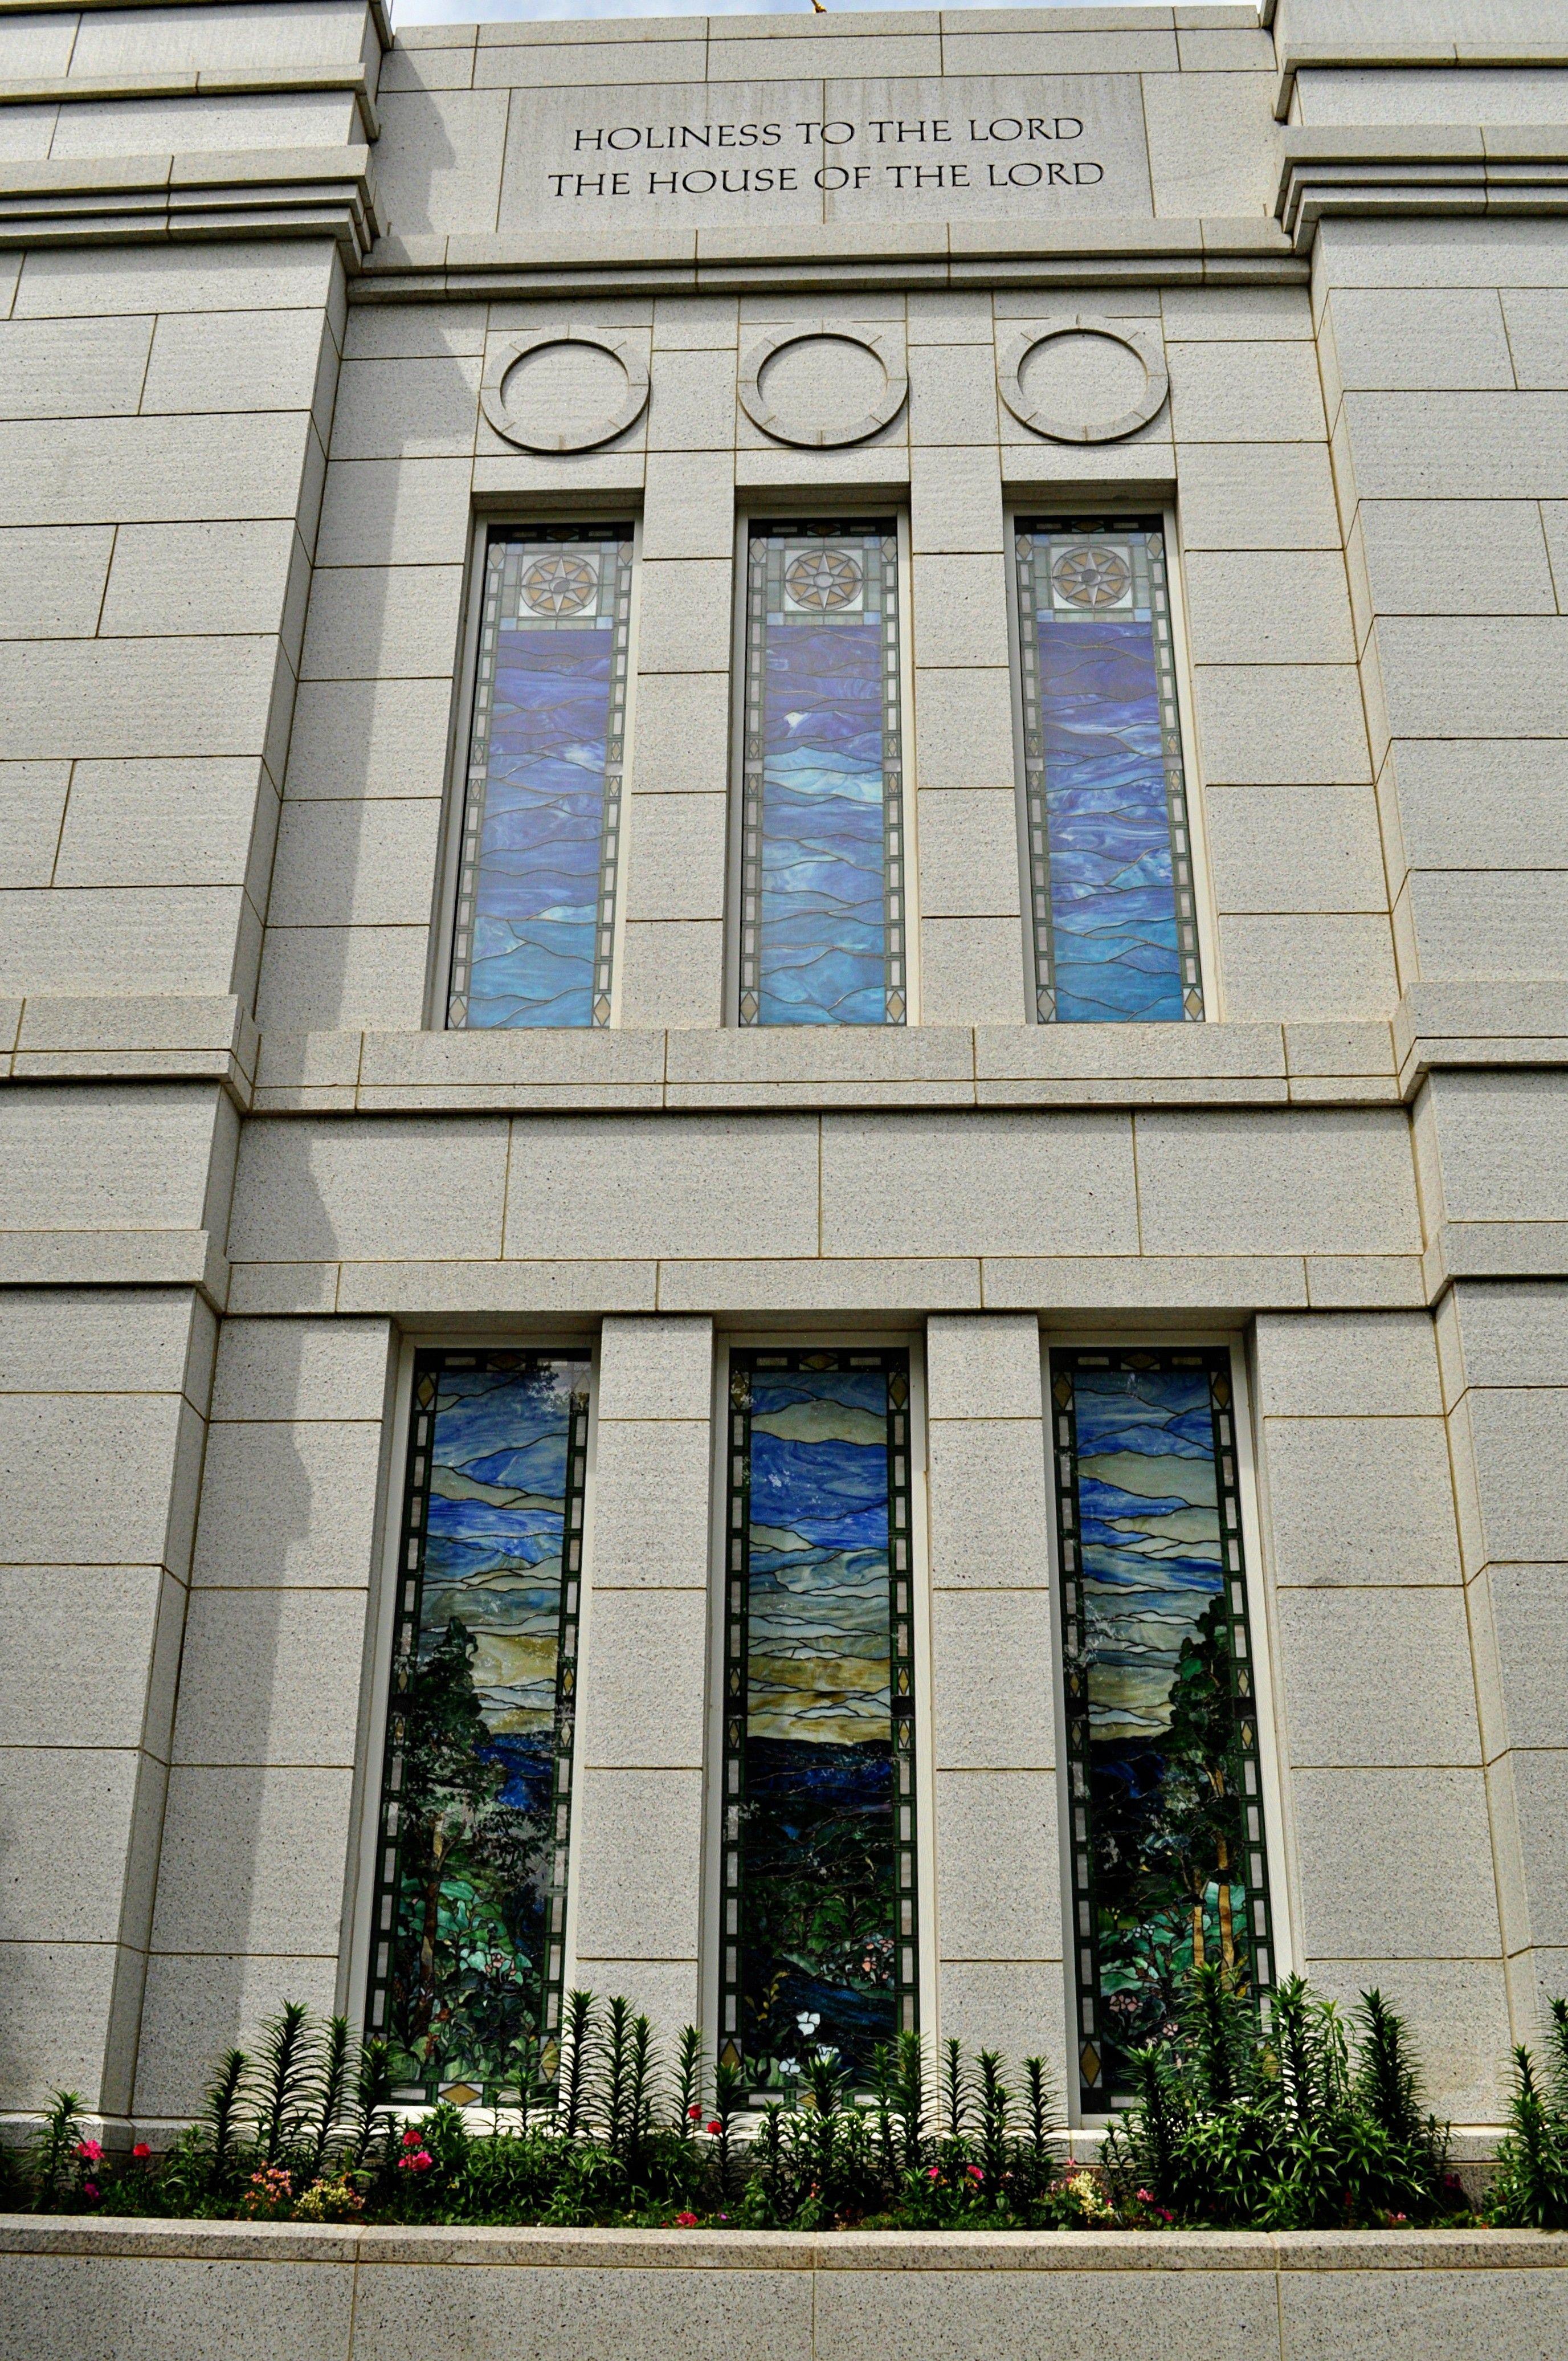 The Winter Quarters Nebraska Temple windows.